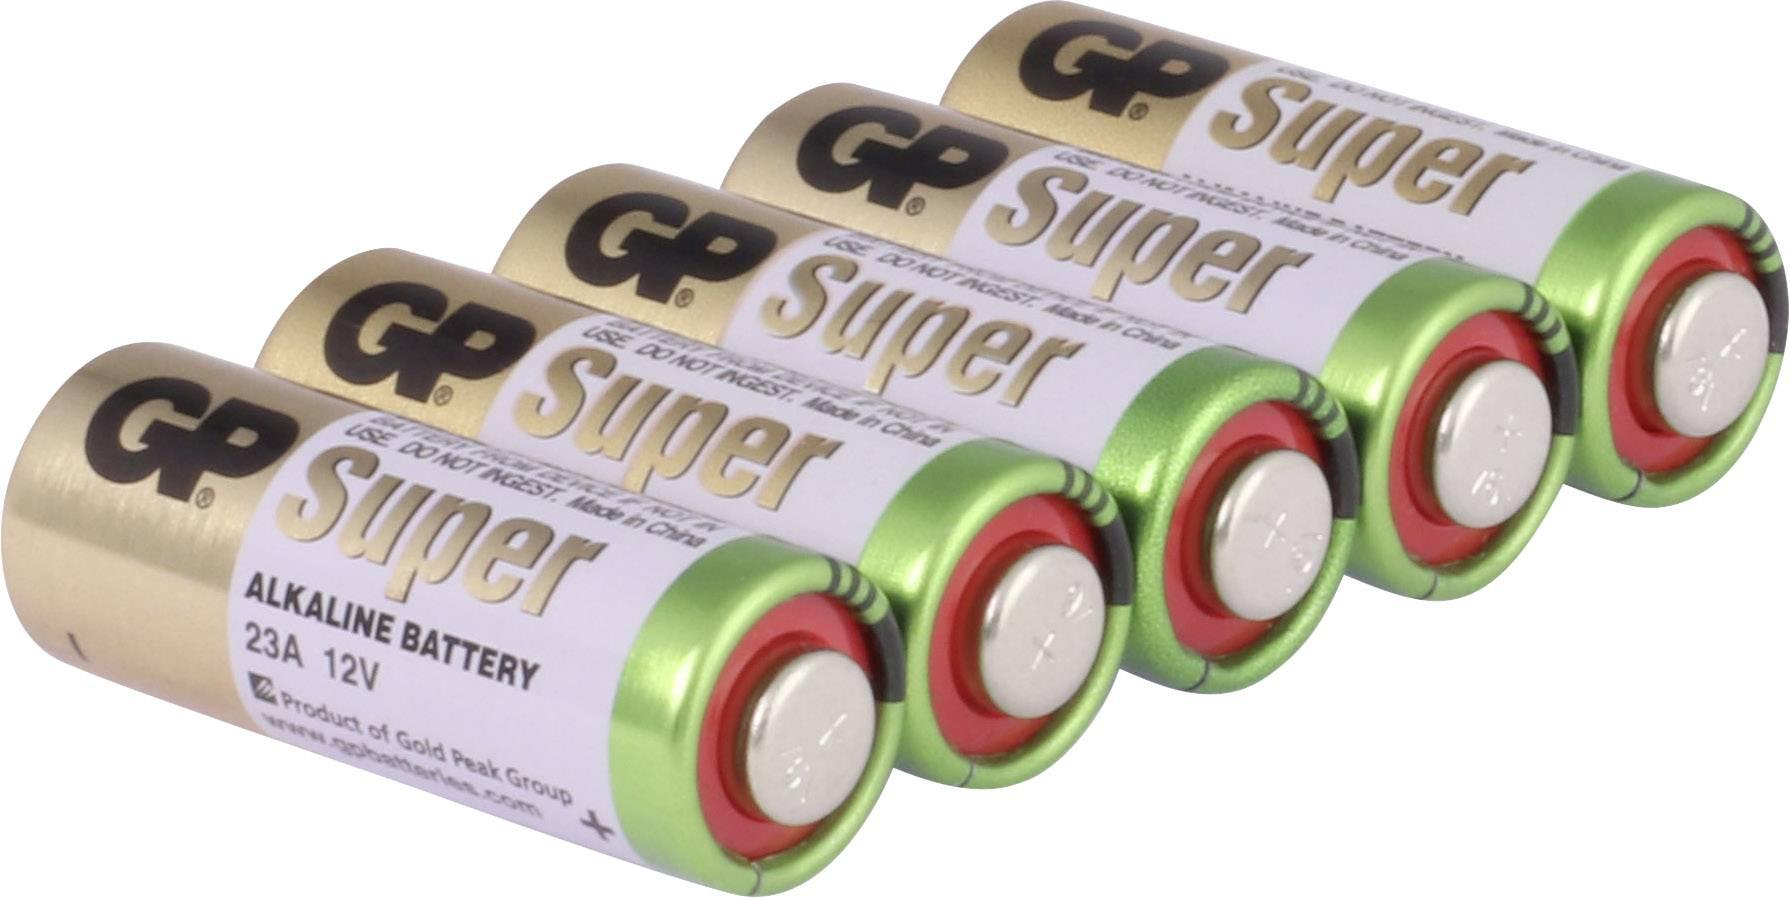 GP Batteries gp23a batterie 38mAh 12v